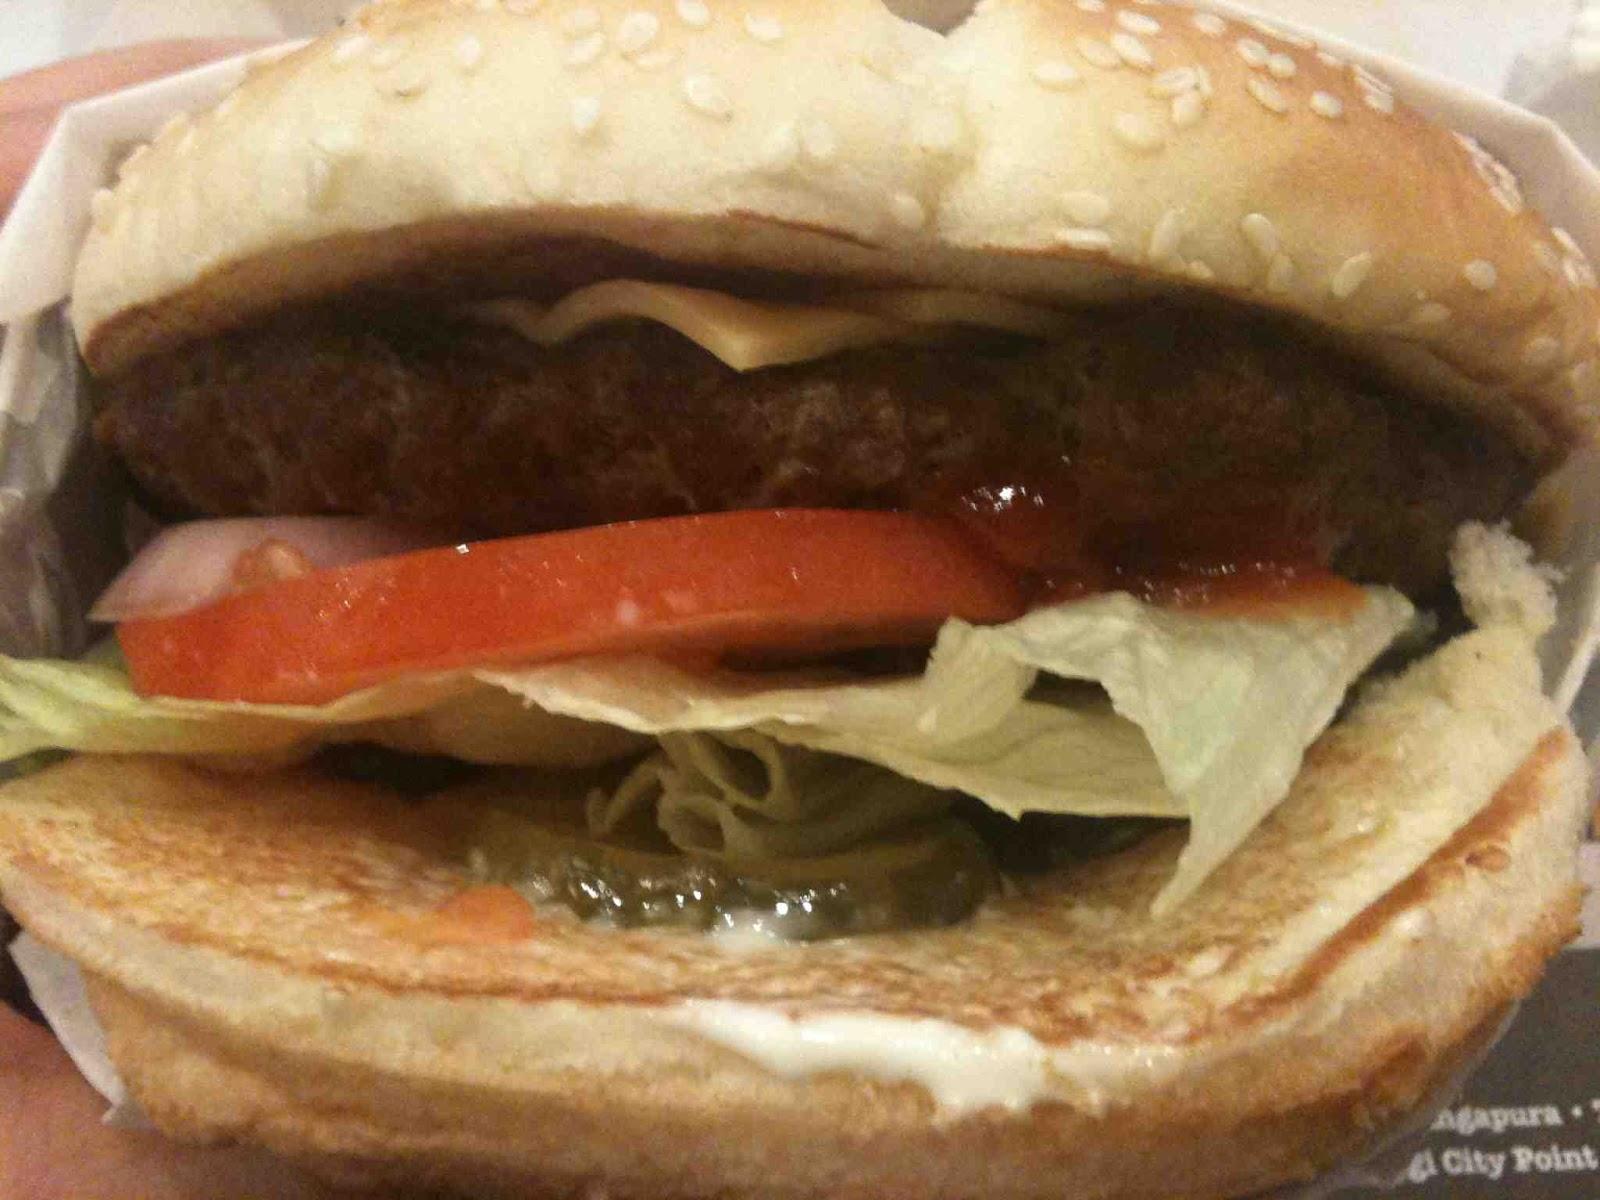 mf's mini world of mf-ism: Fast food beef burgers in Singapore